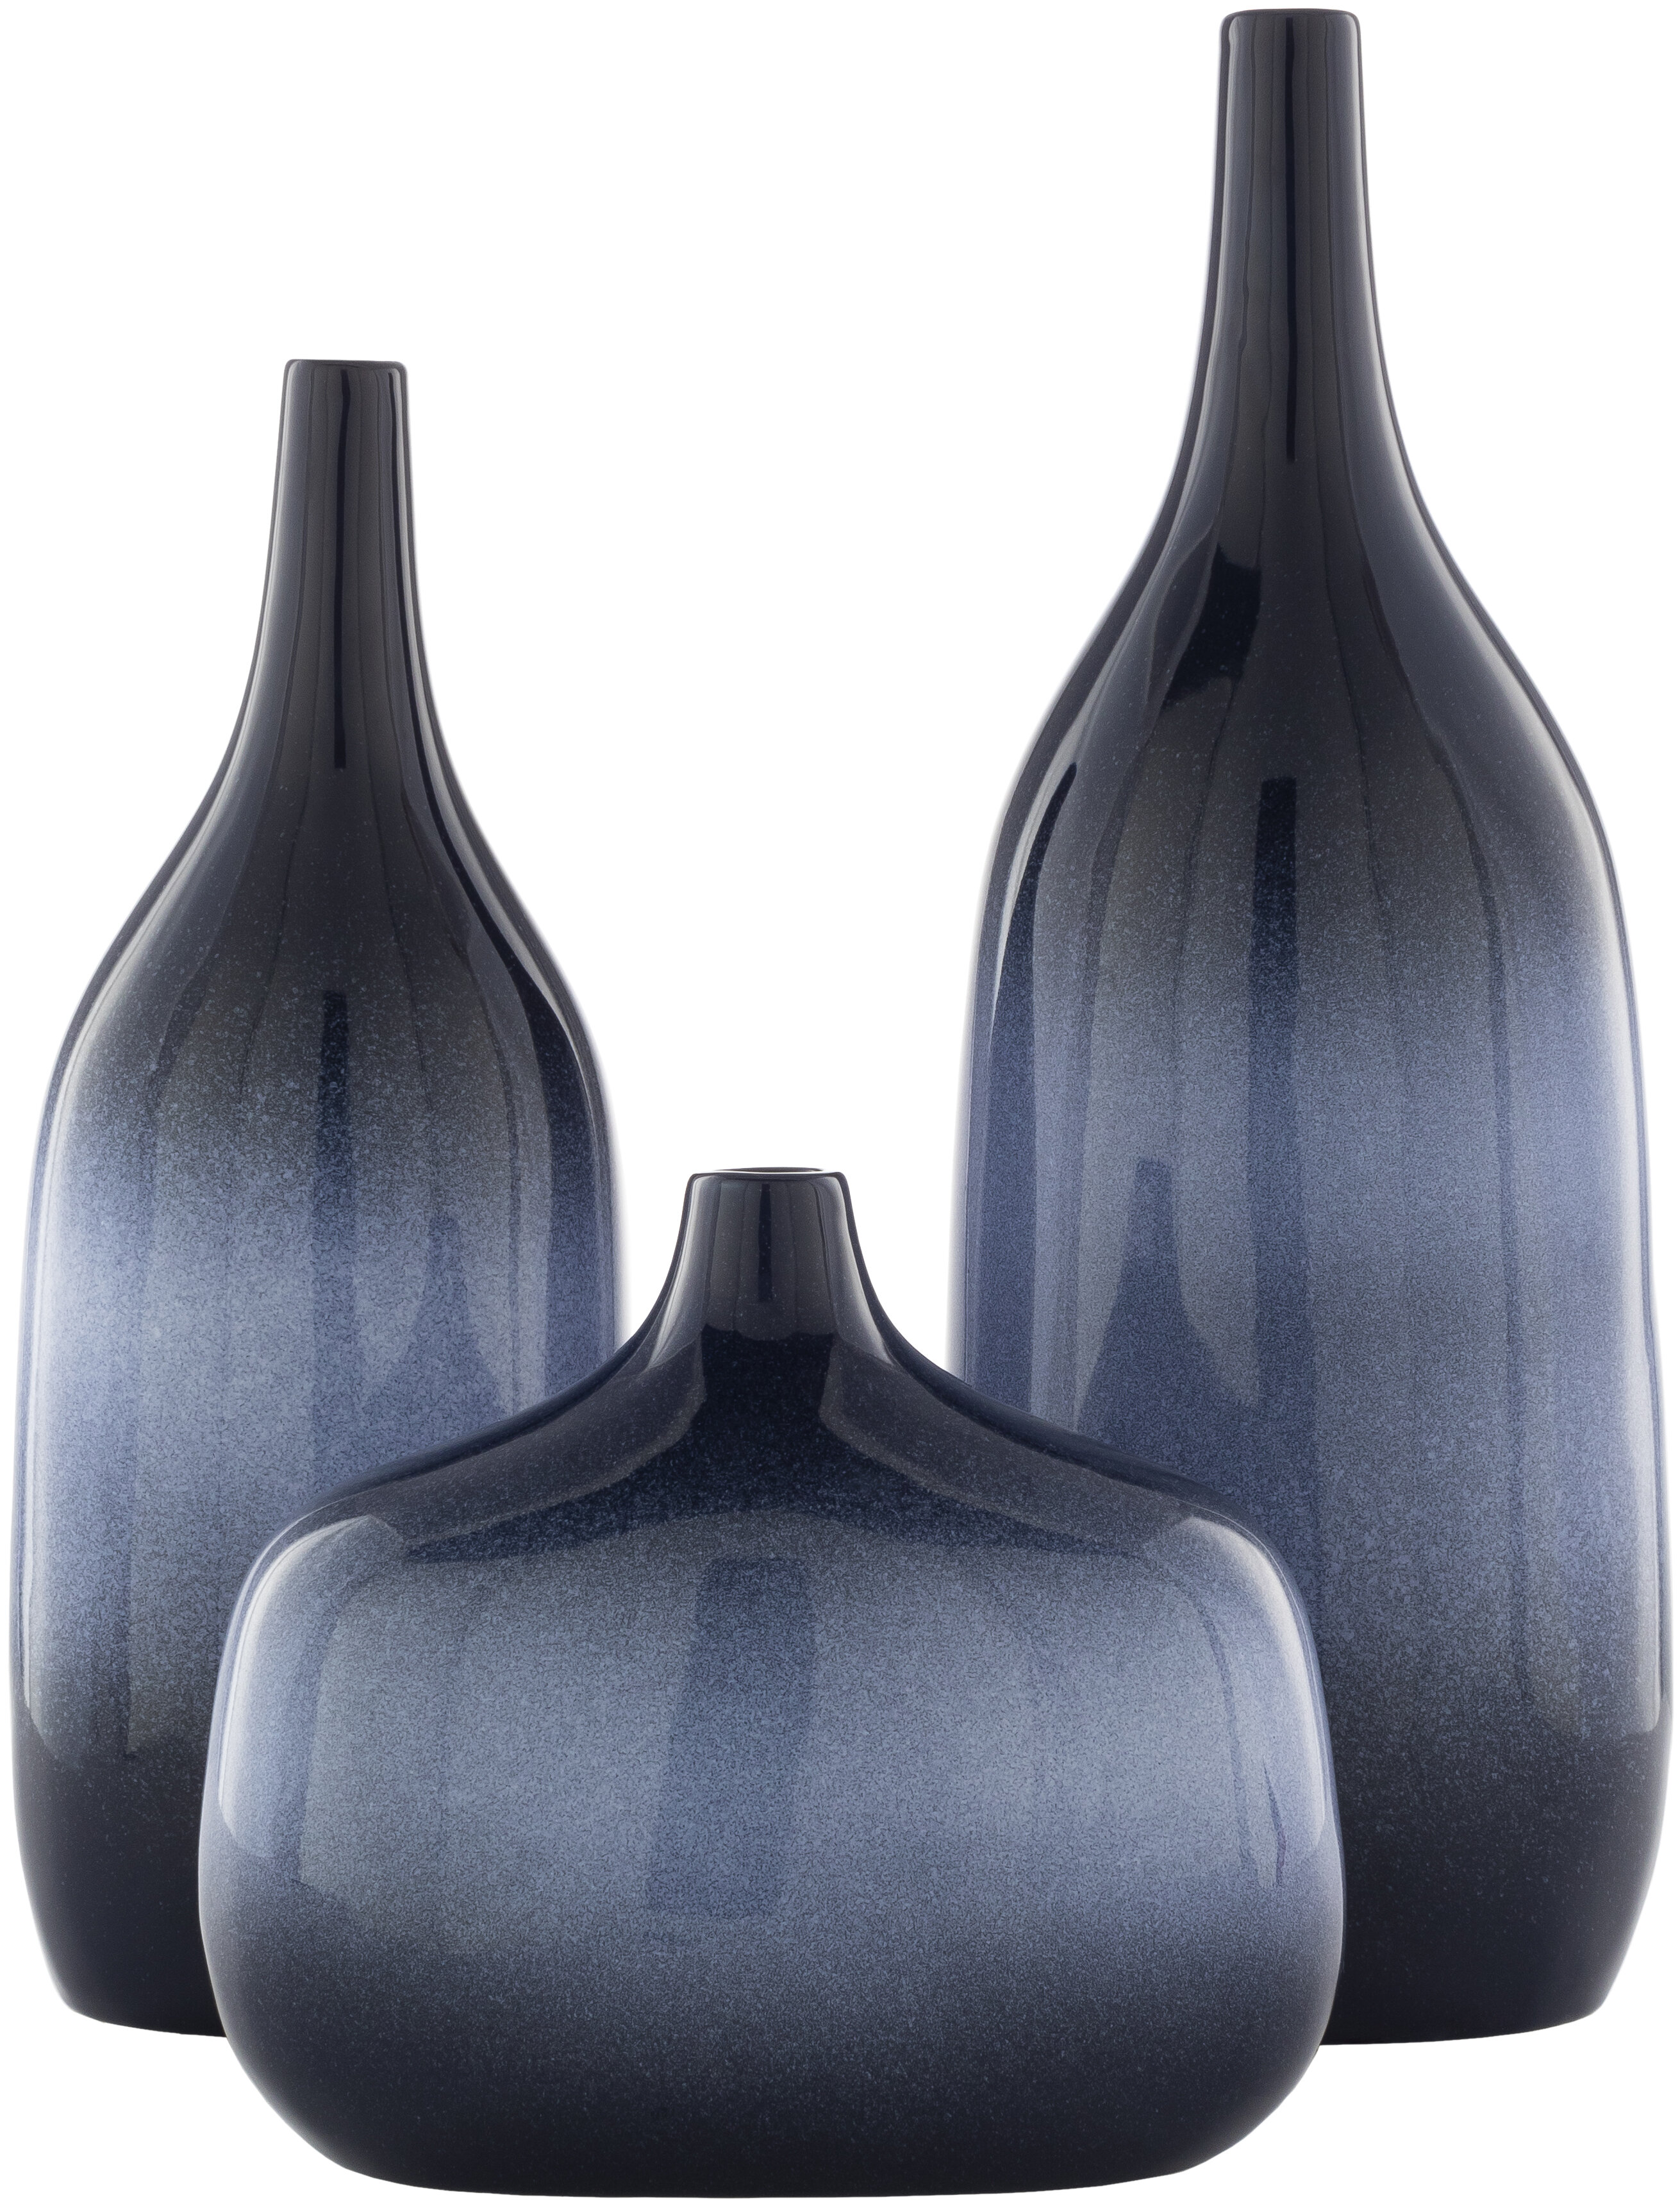 Luxury Black Vases Perigold